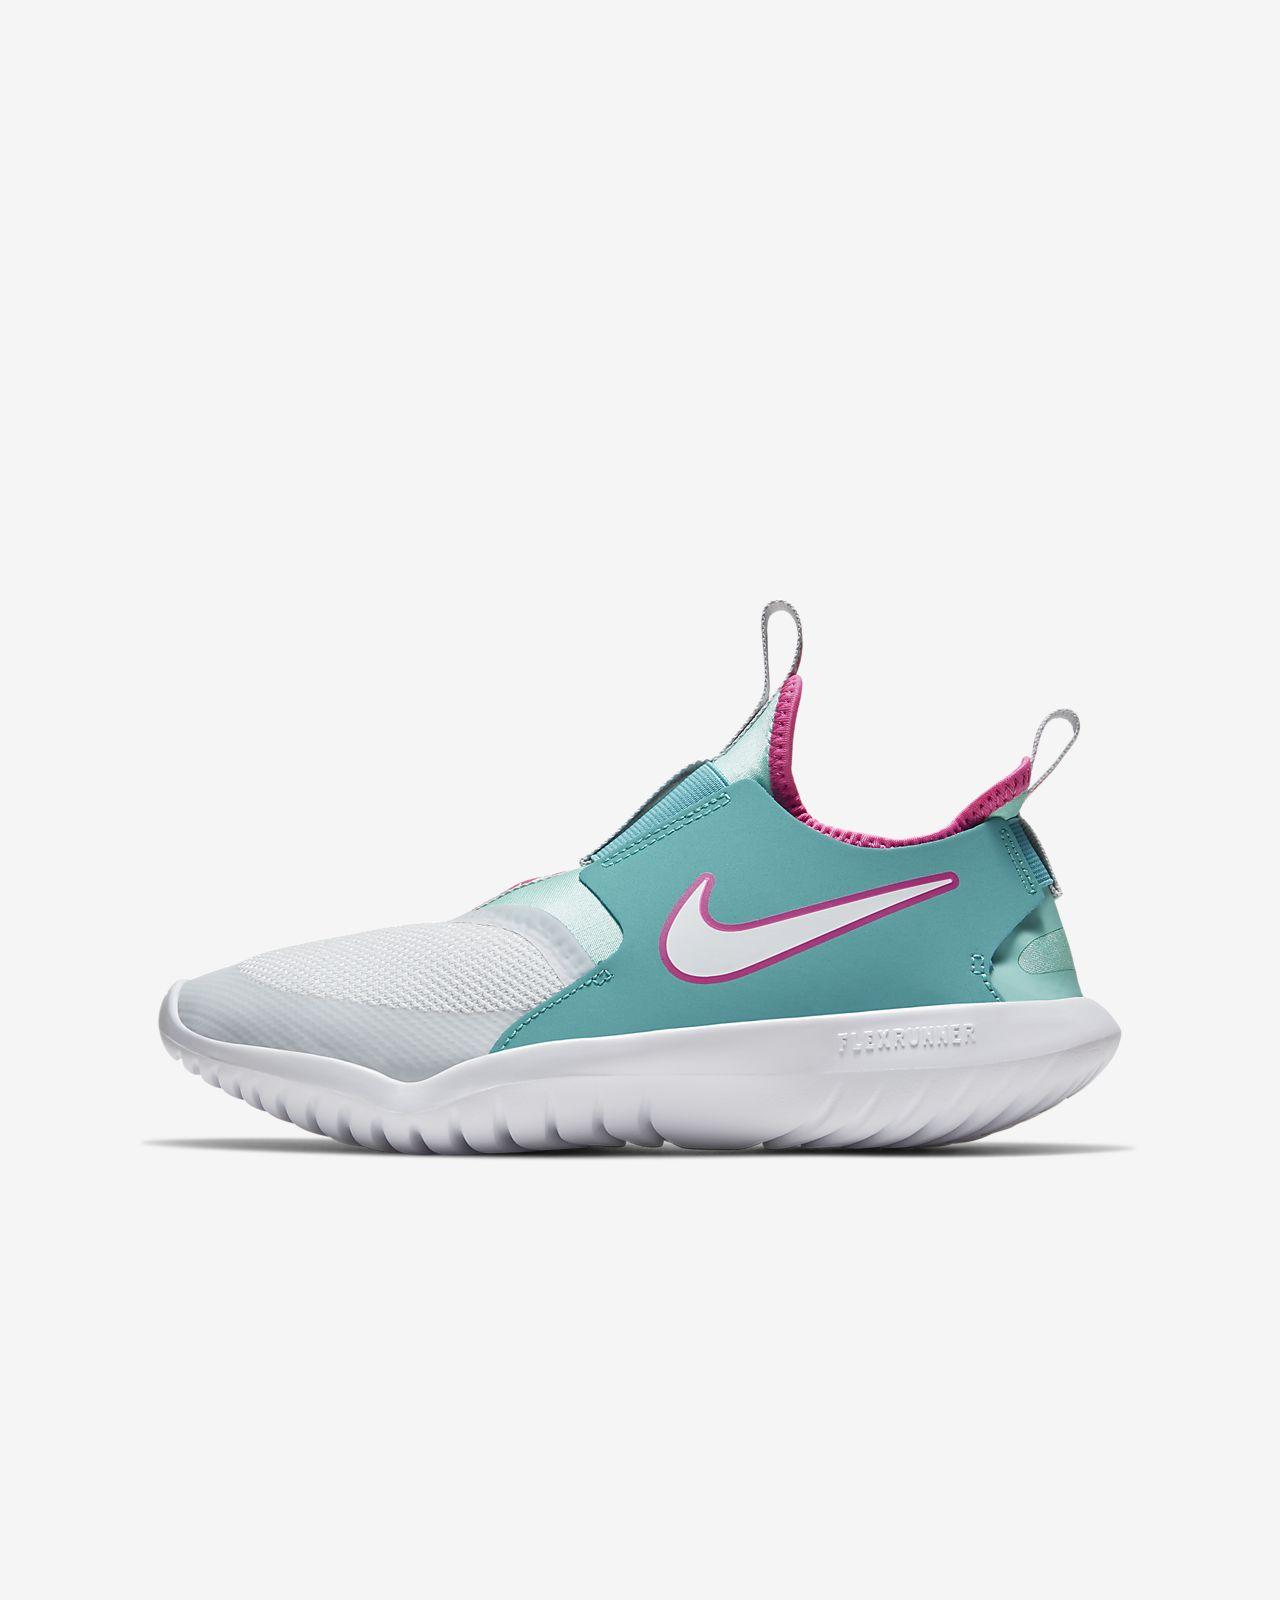 Nike Flex Runner Aqua Big Kids' Running Shoe